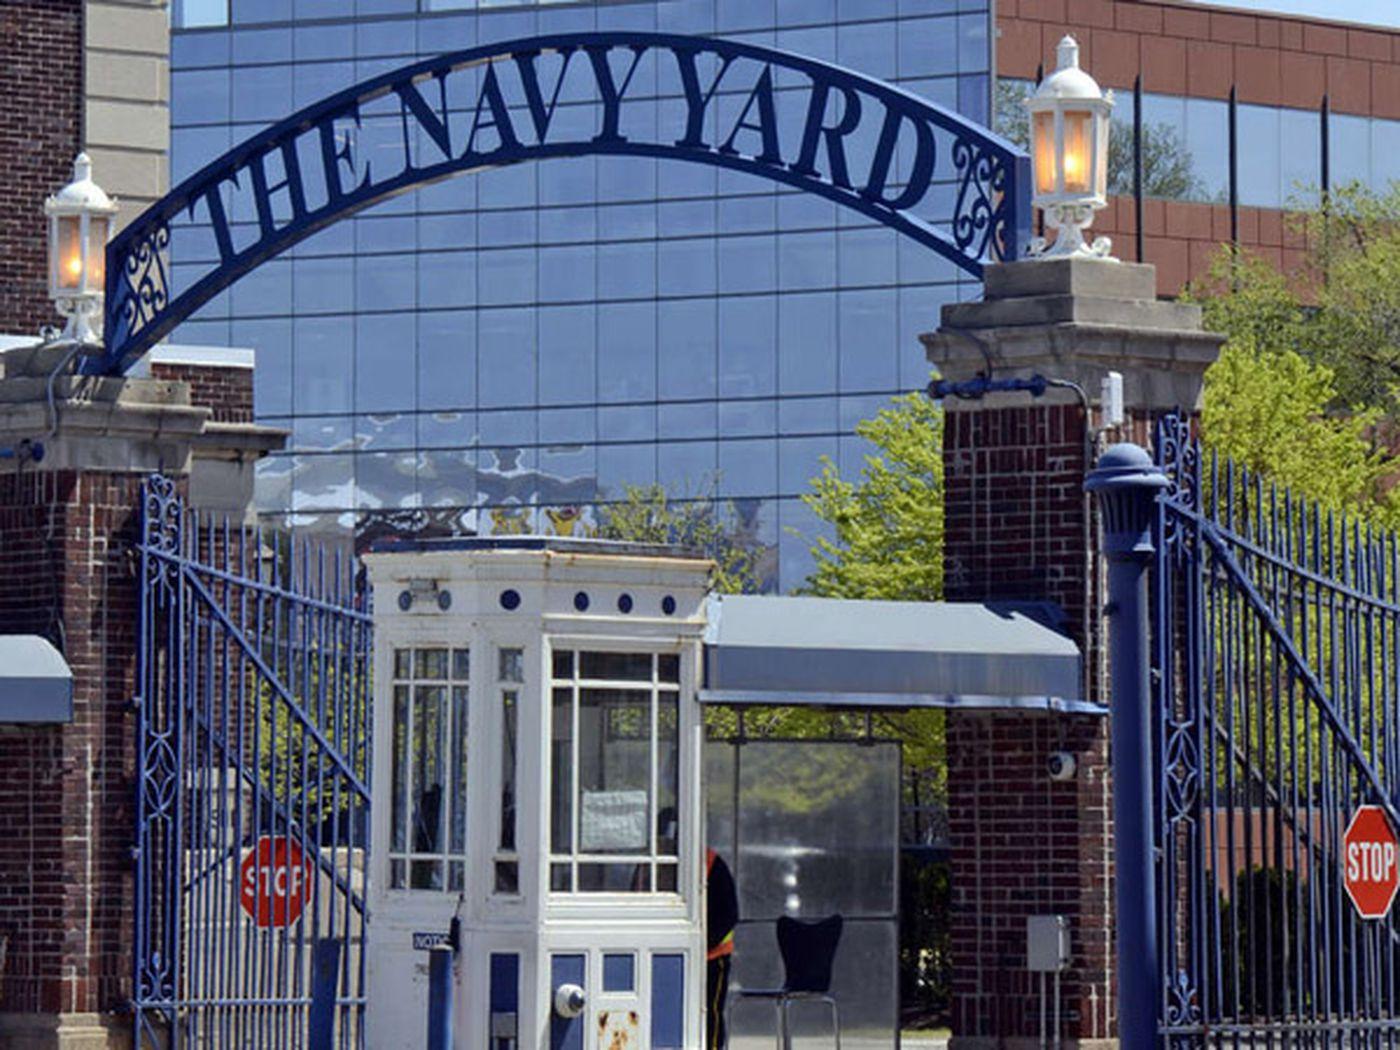 The Philadelphia Navy Yard